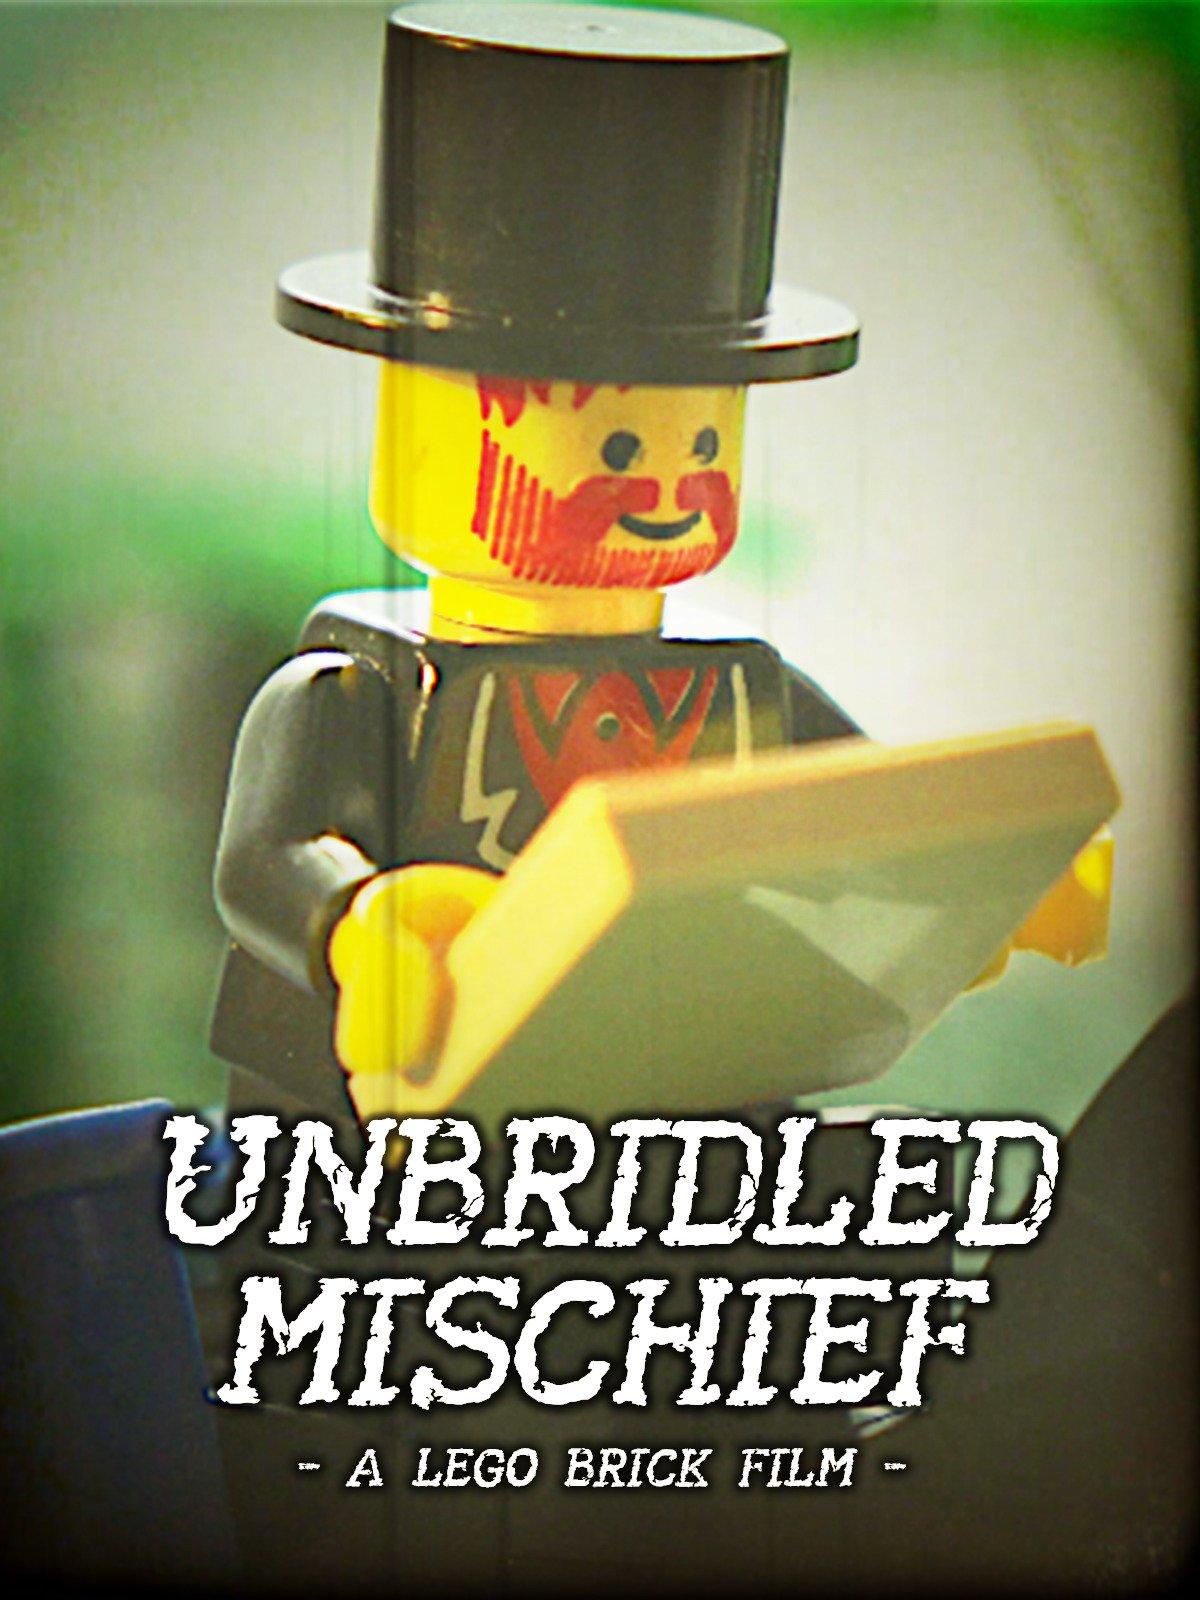 Unbridled Mischief: A Lego Brick Film